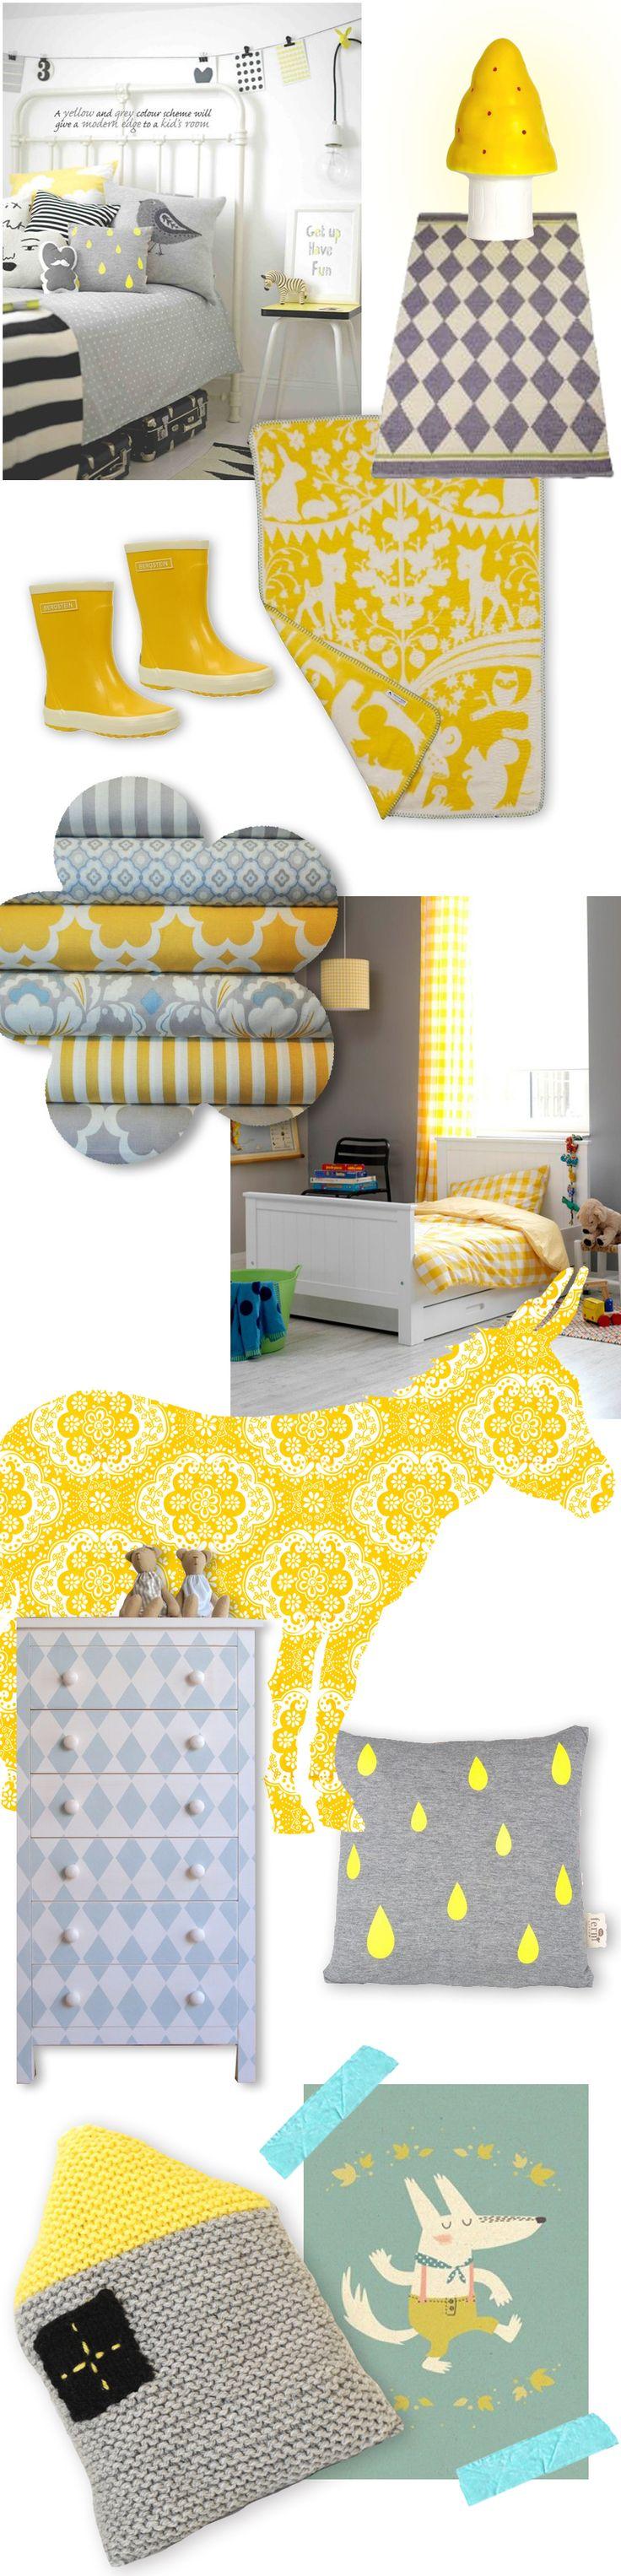 #nursery #kidsroom #yellow #grey